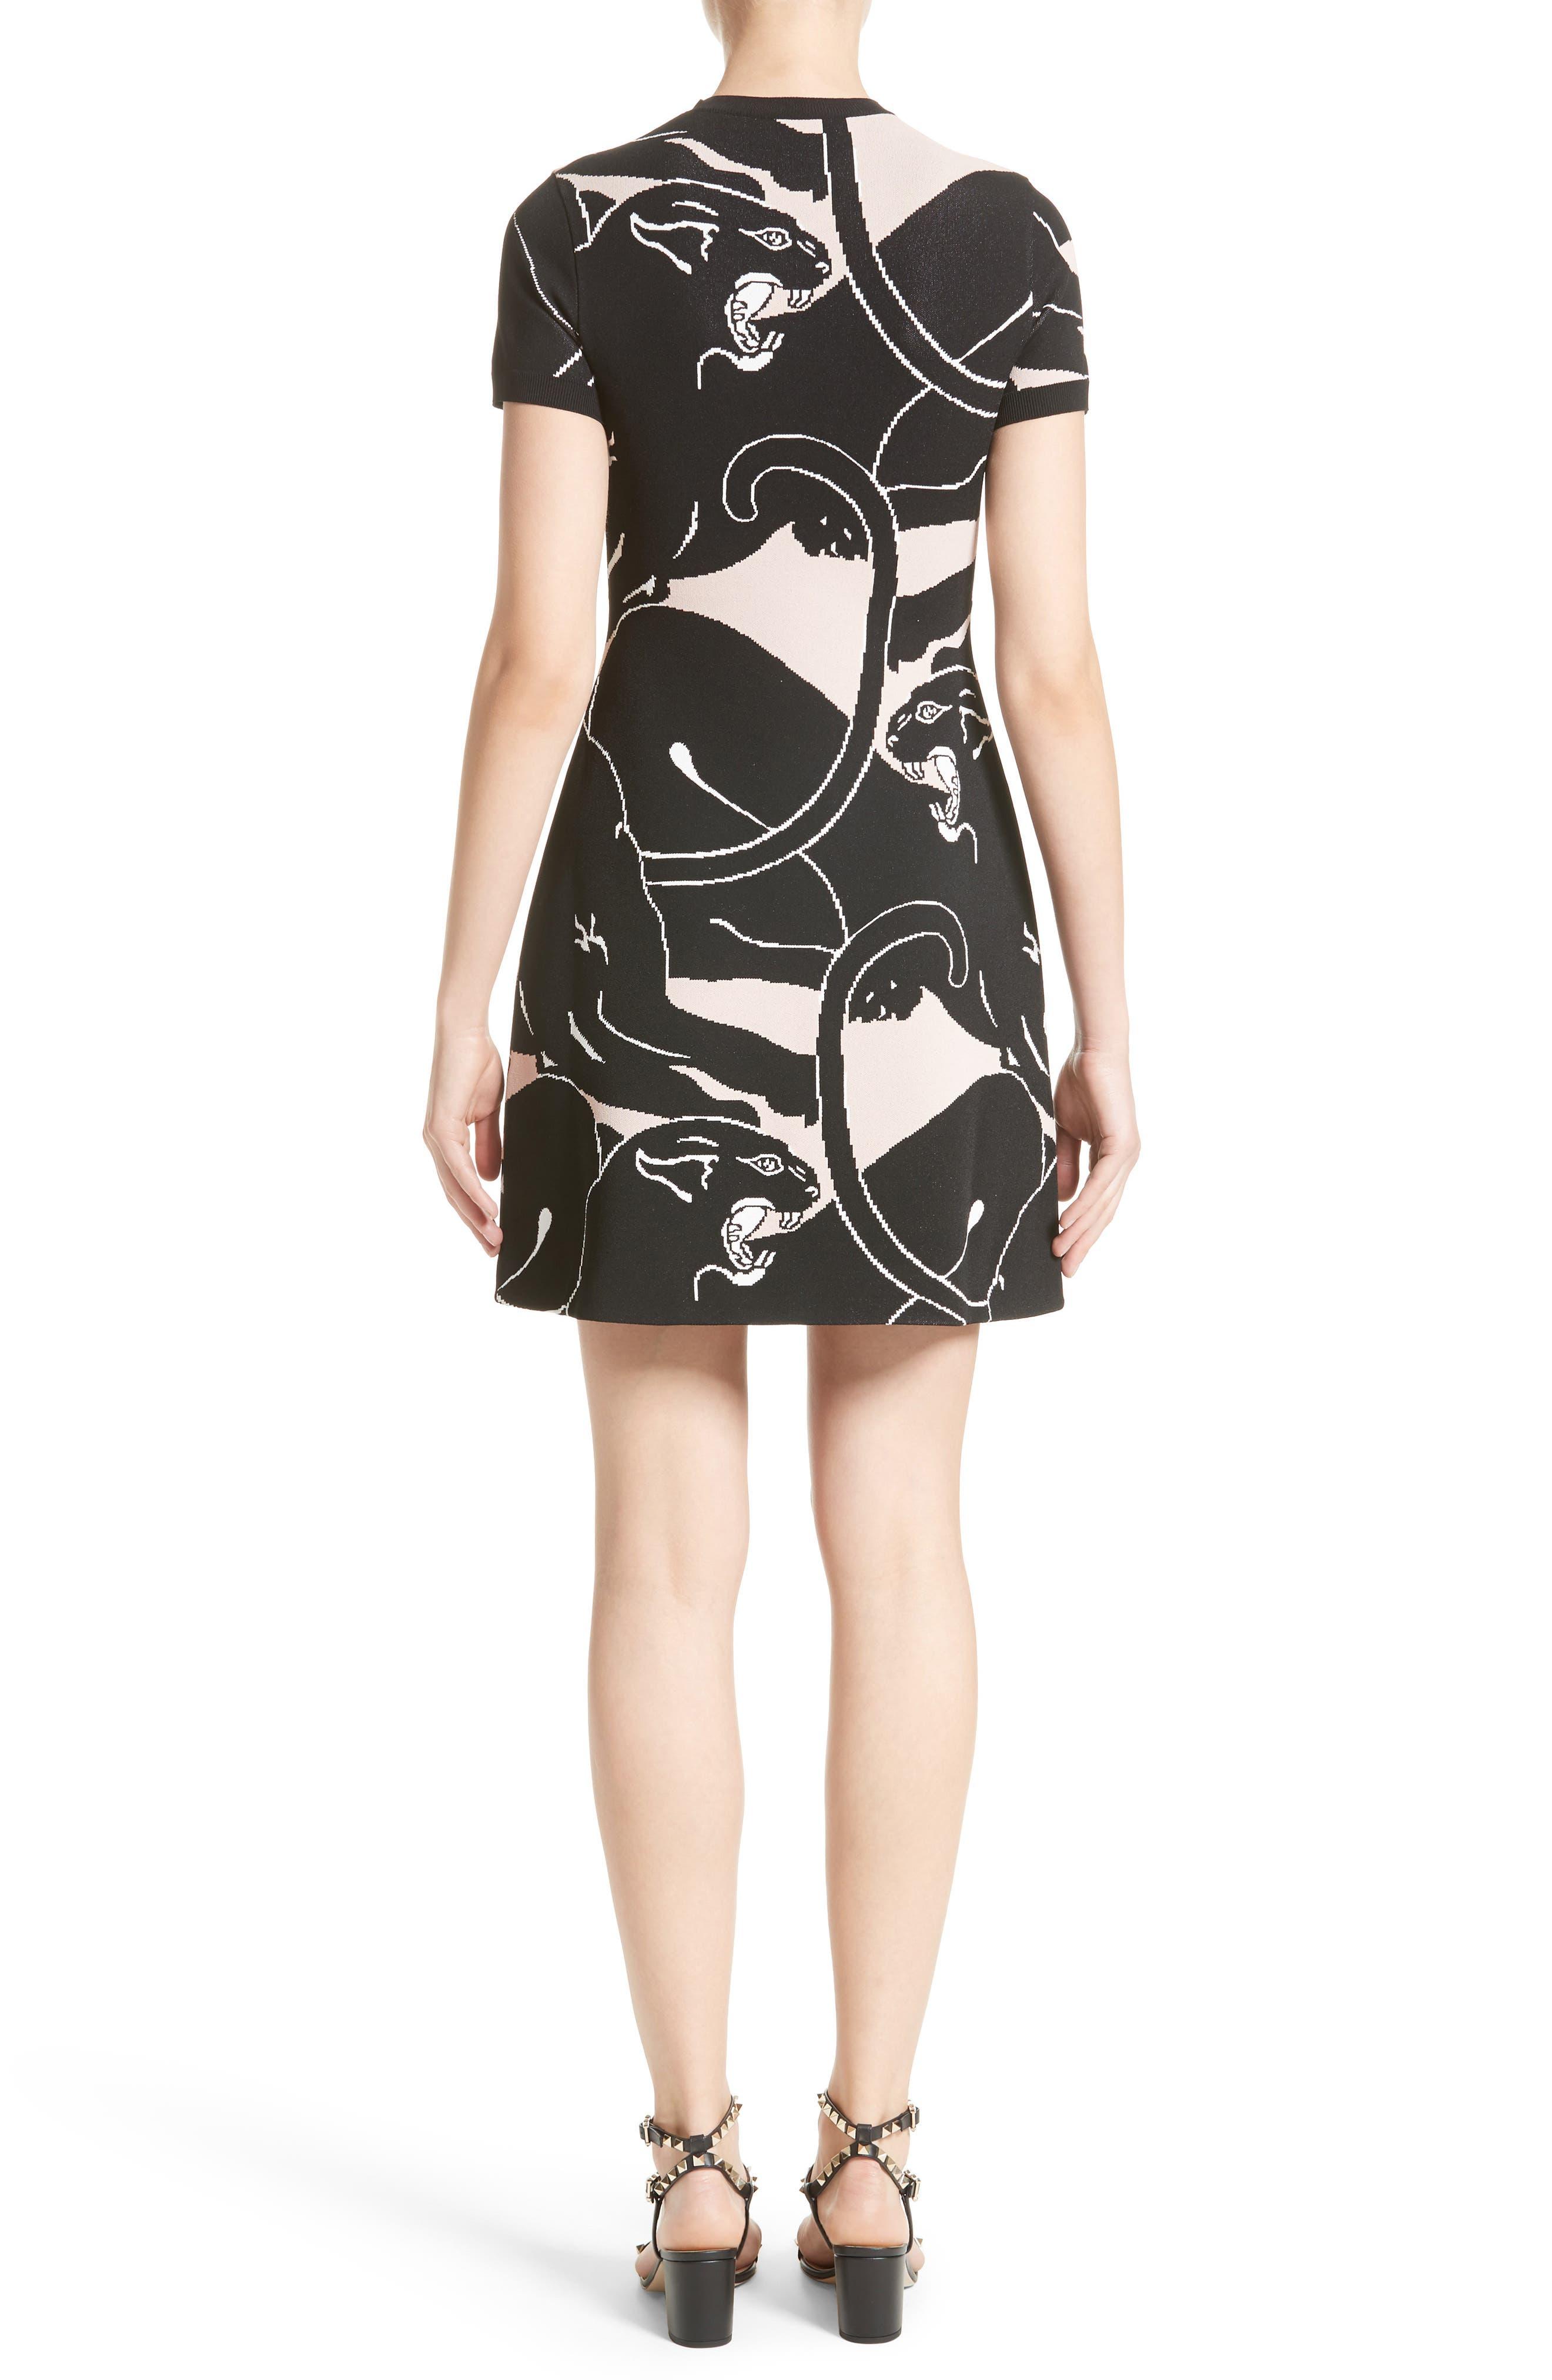 Jacquard Panther Print Dress,                             Alternate thumbnail 2, color,                             001